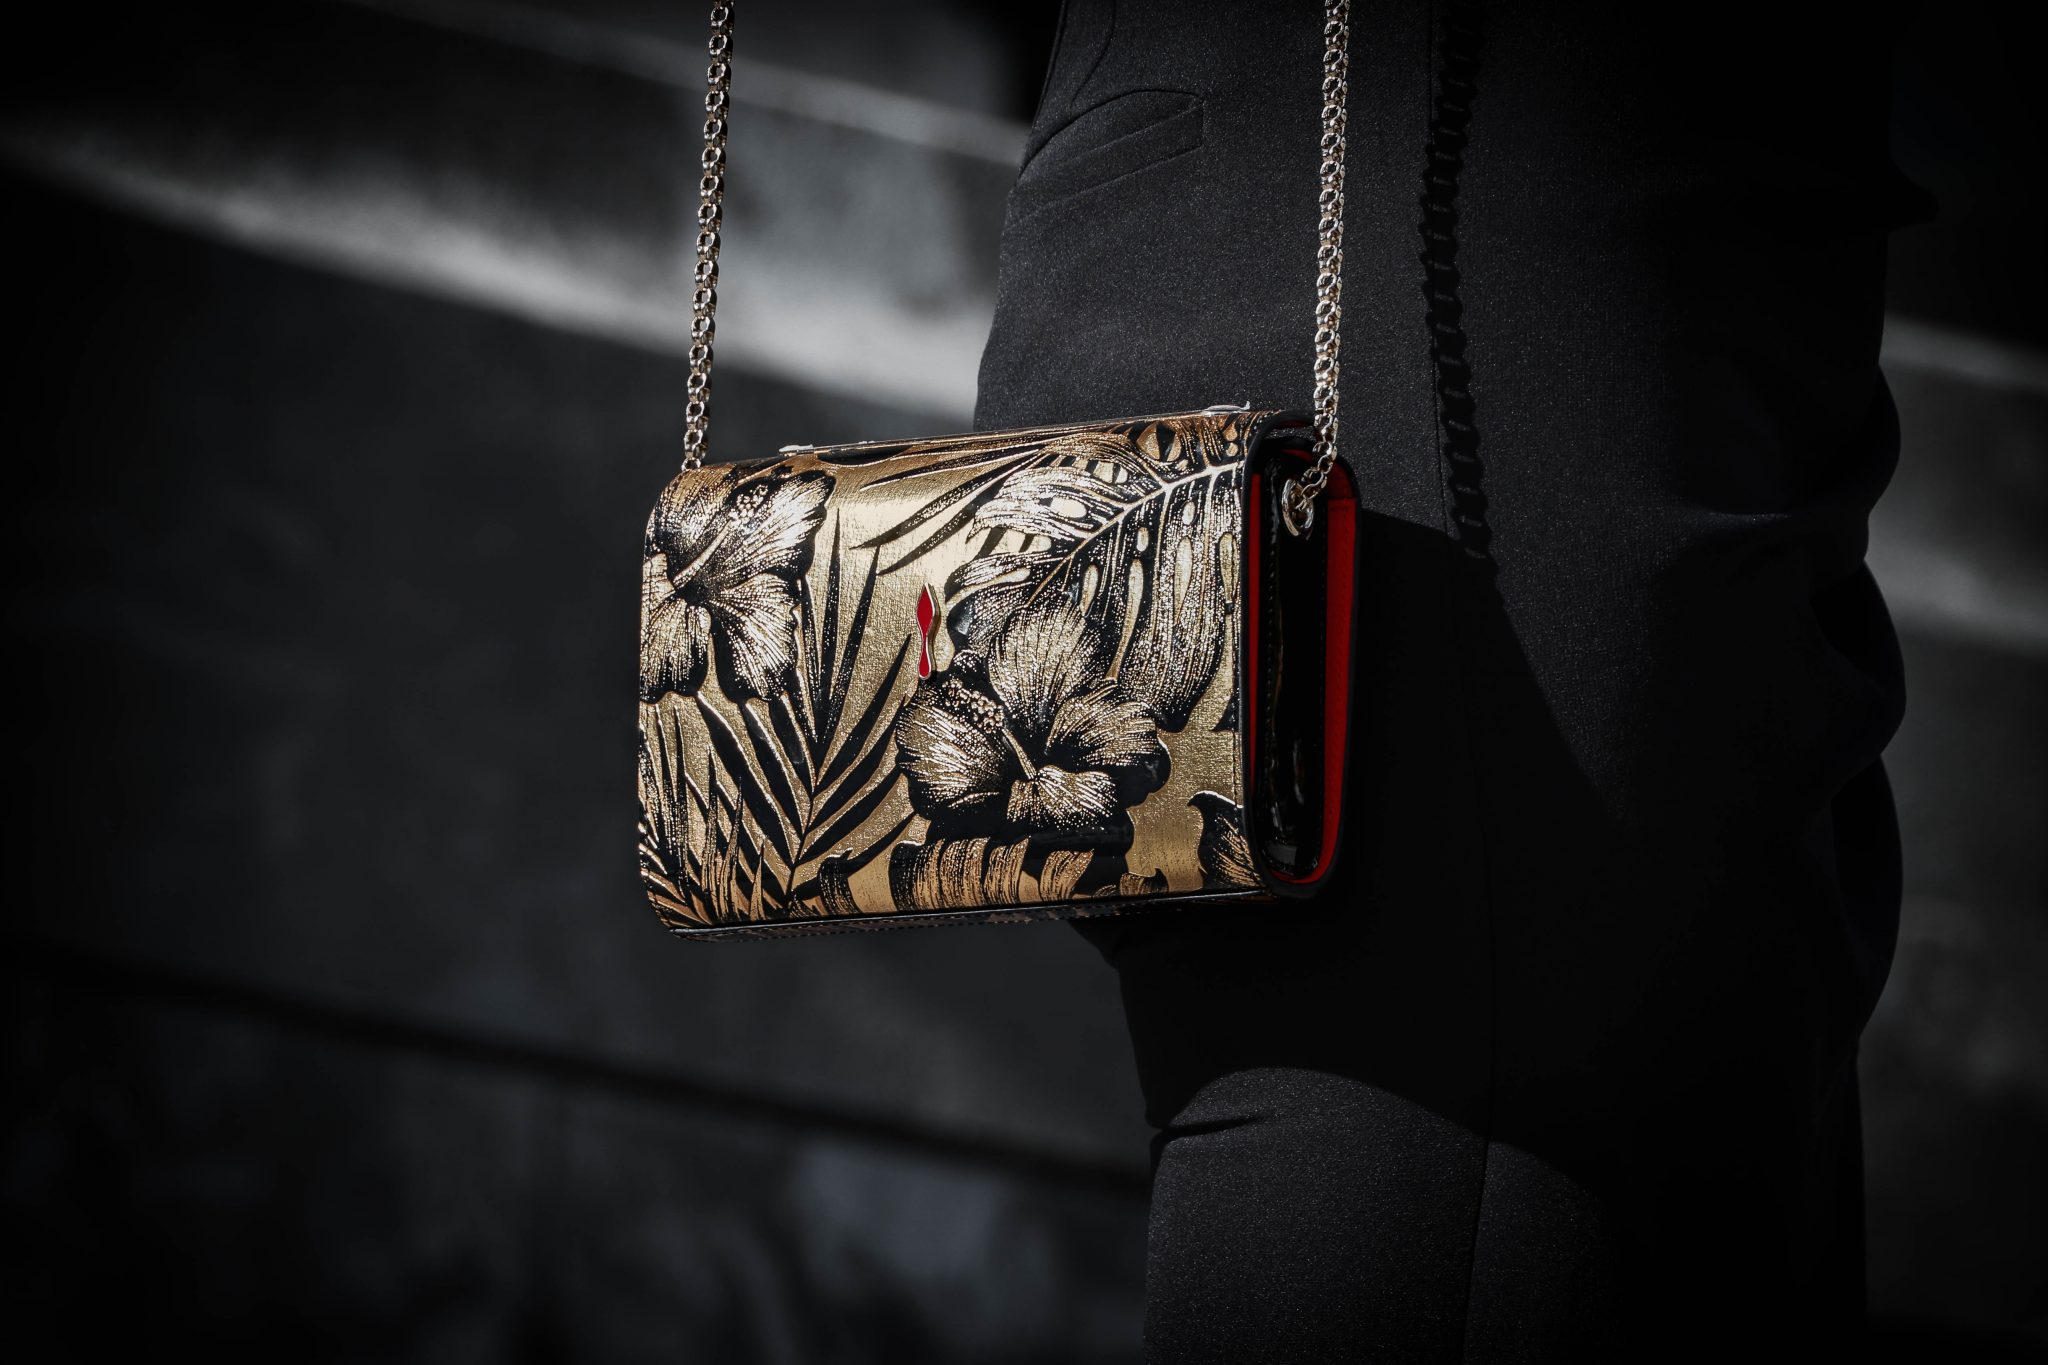 French Photographer Fashion Photography Louboutin Handbag